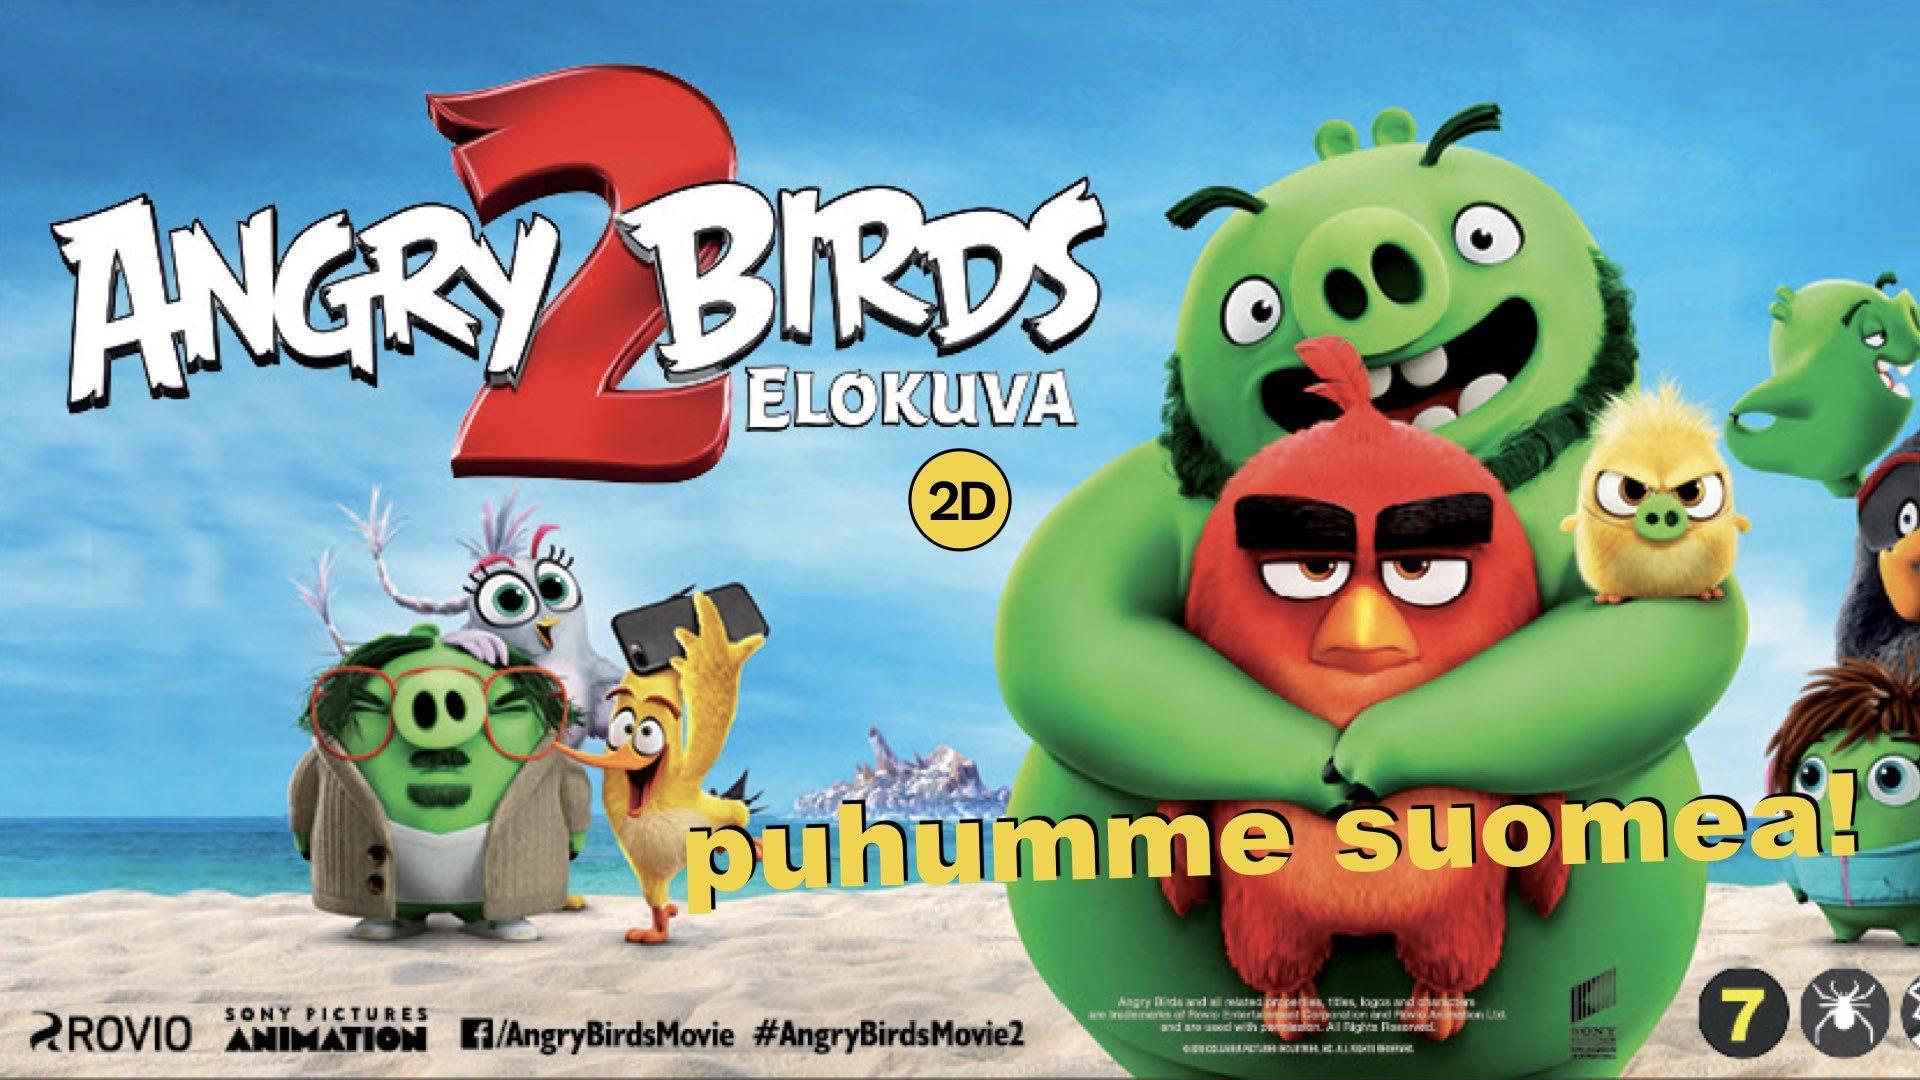 Angry Birds -elokuva 2 (2D suomeksi)